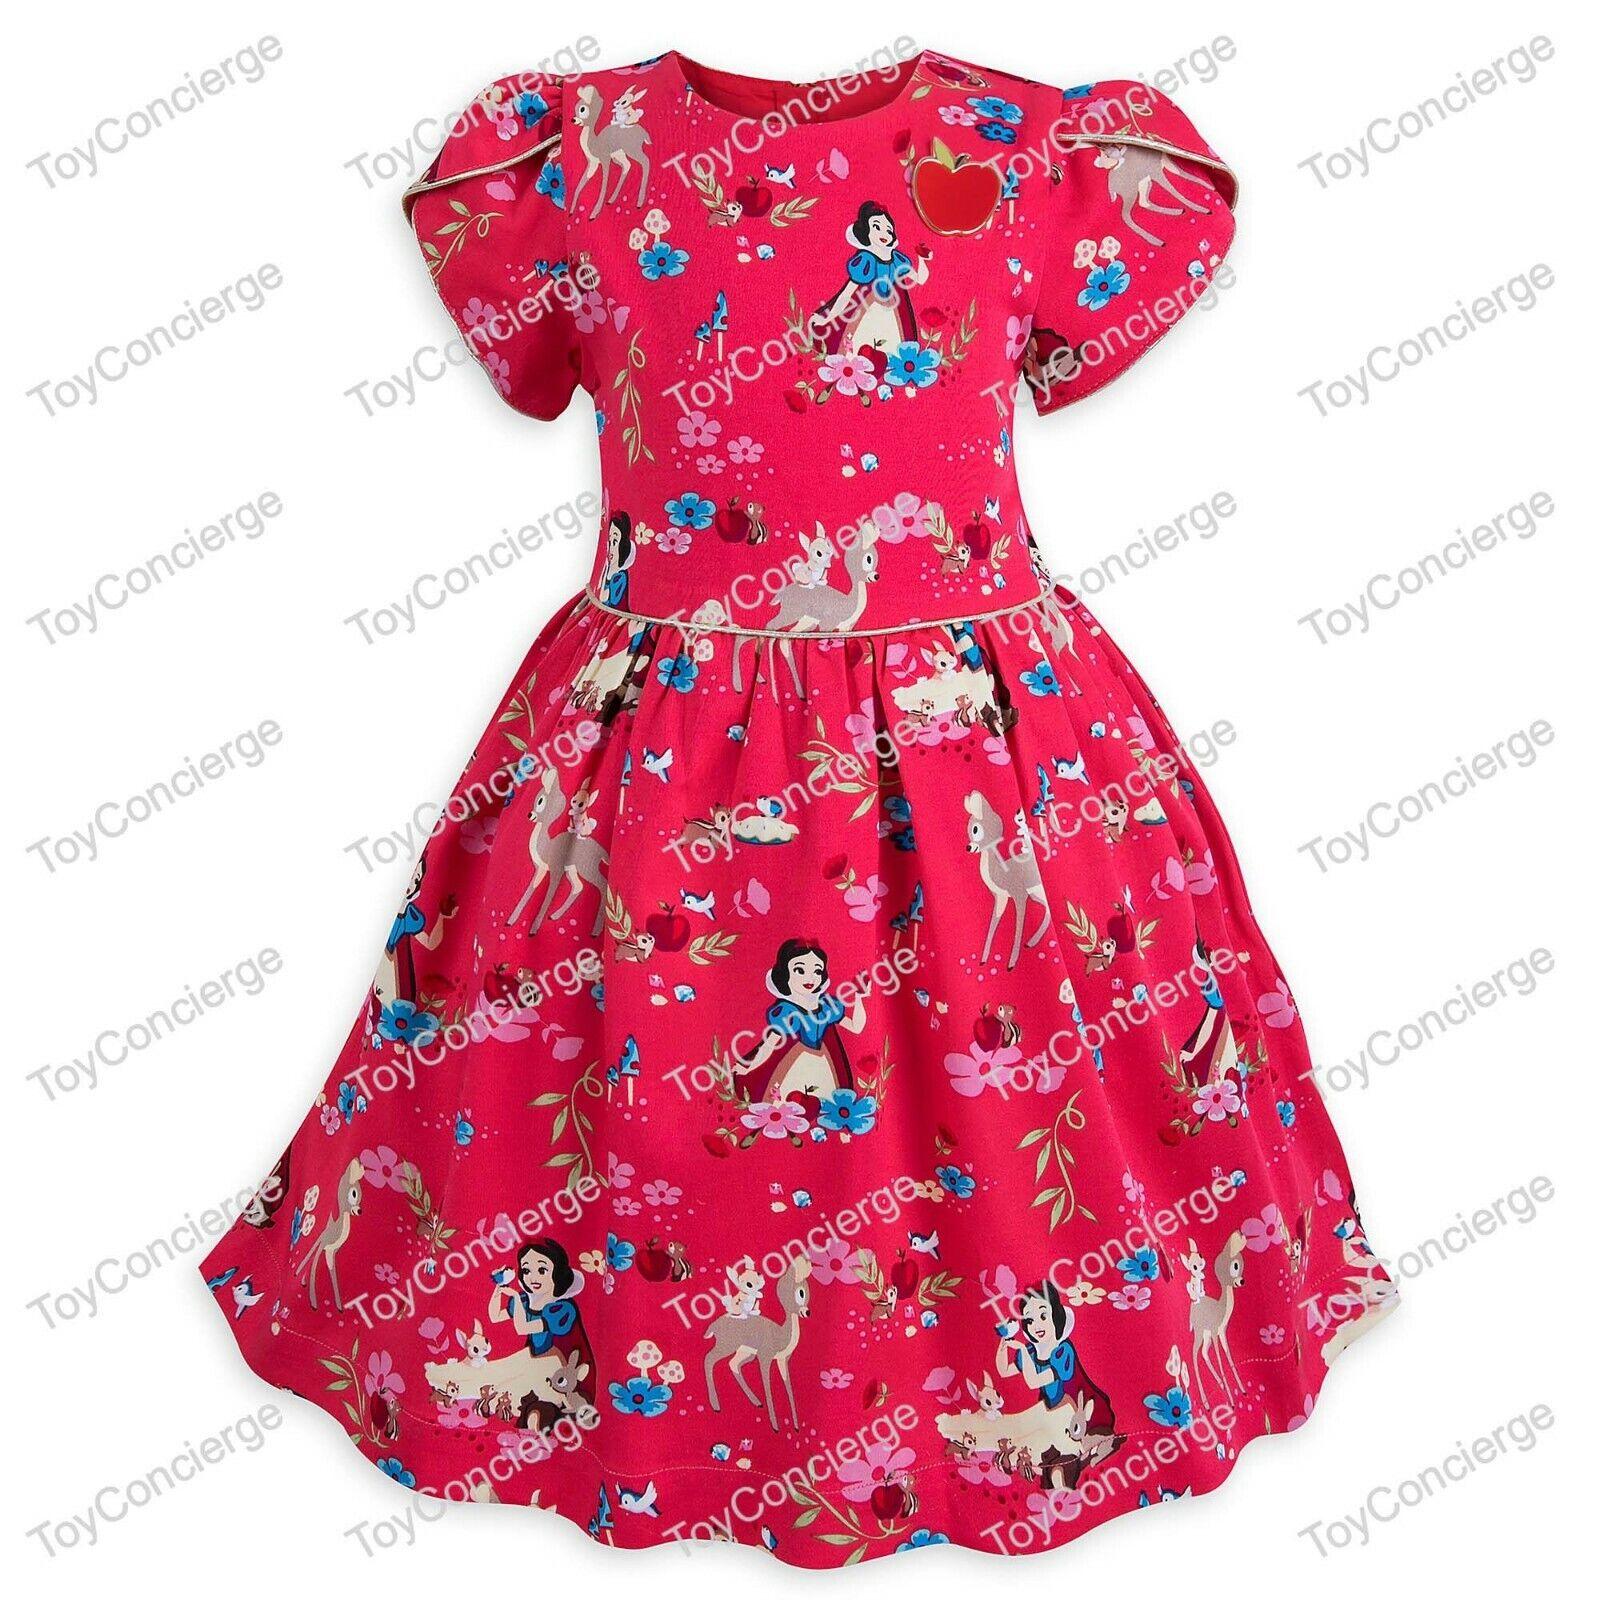 DISNEY Store DRESS for Girls SNOW WHITE PARTY Dress Pick Siz